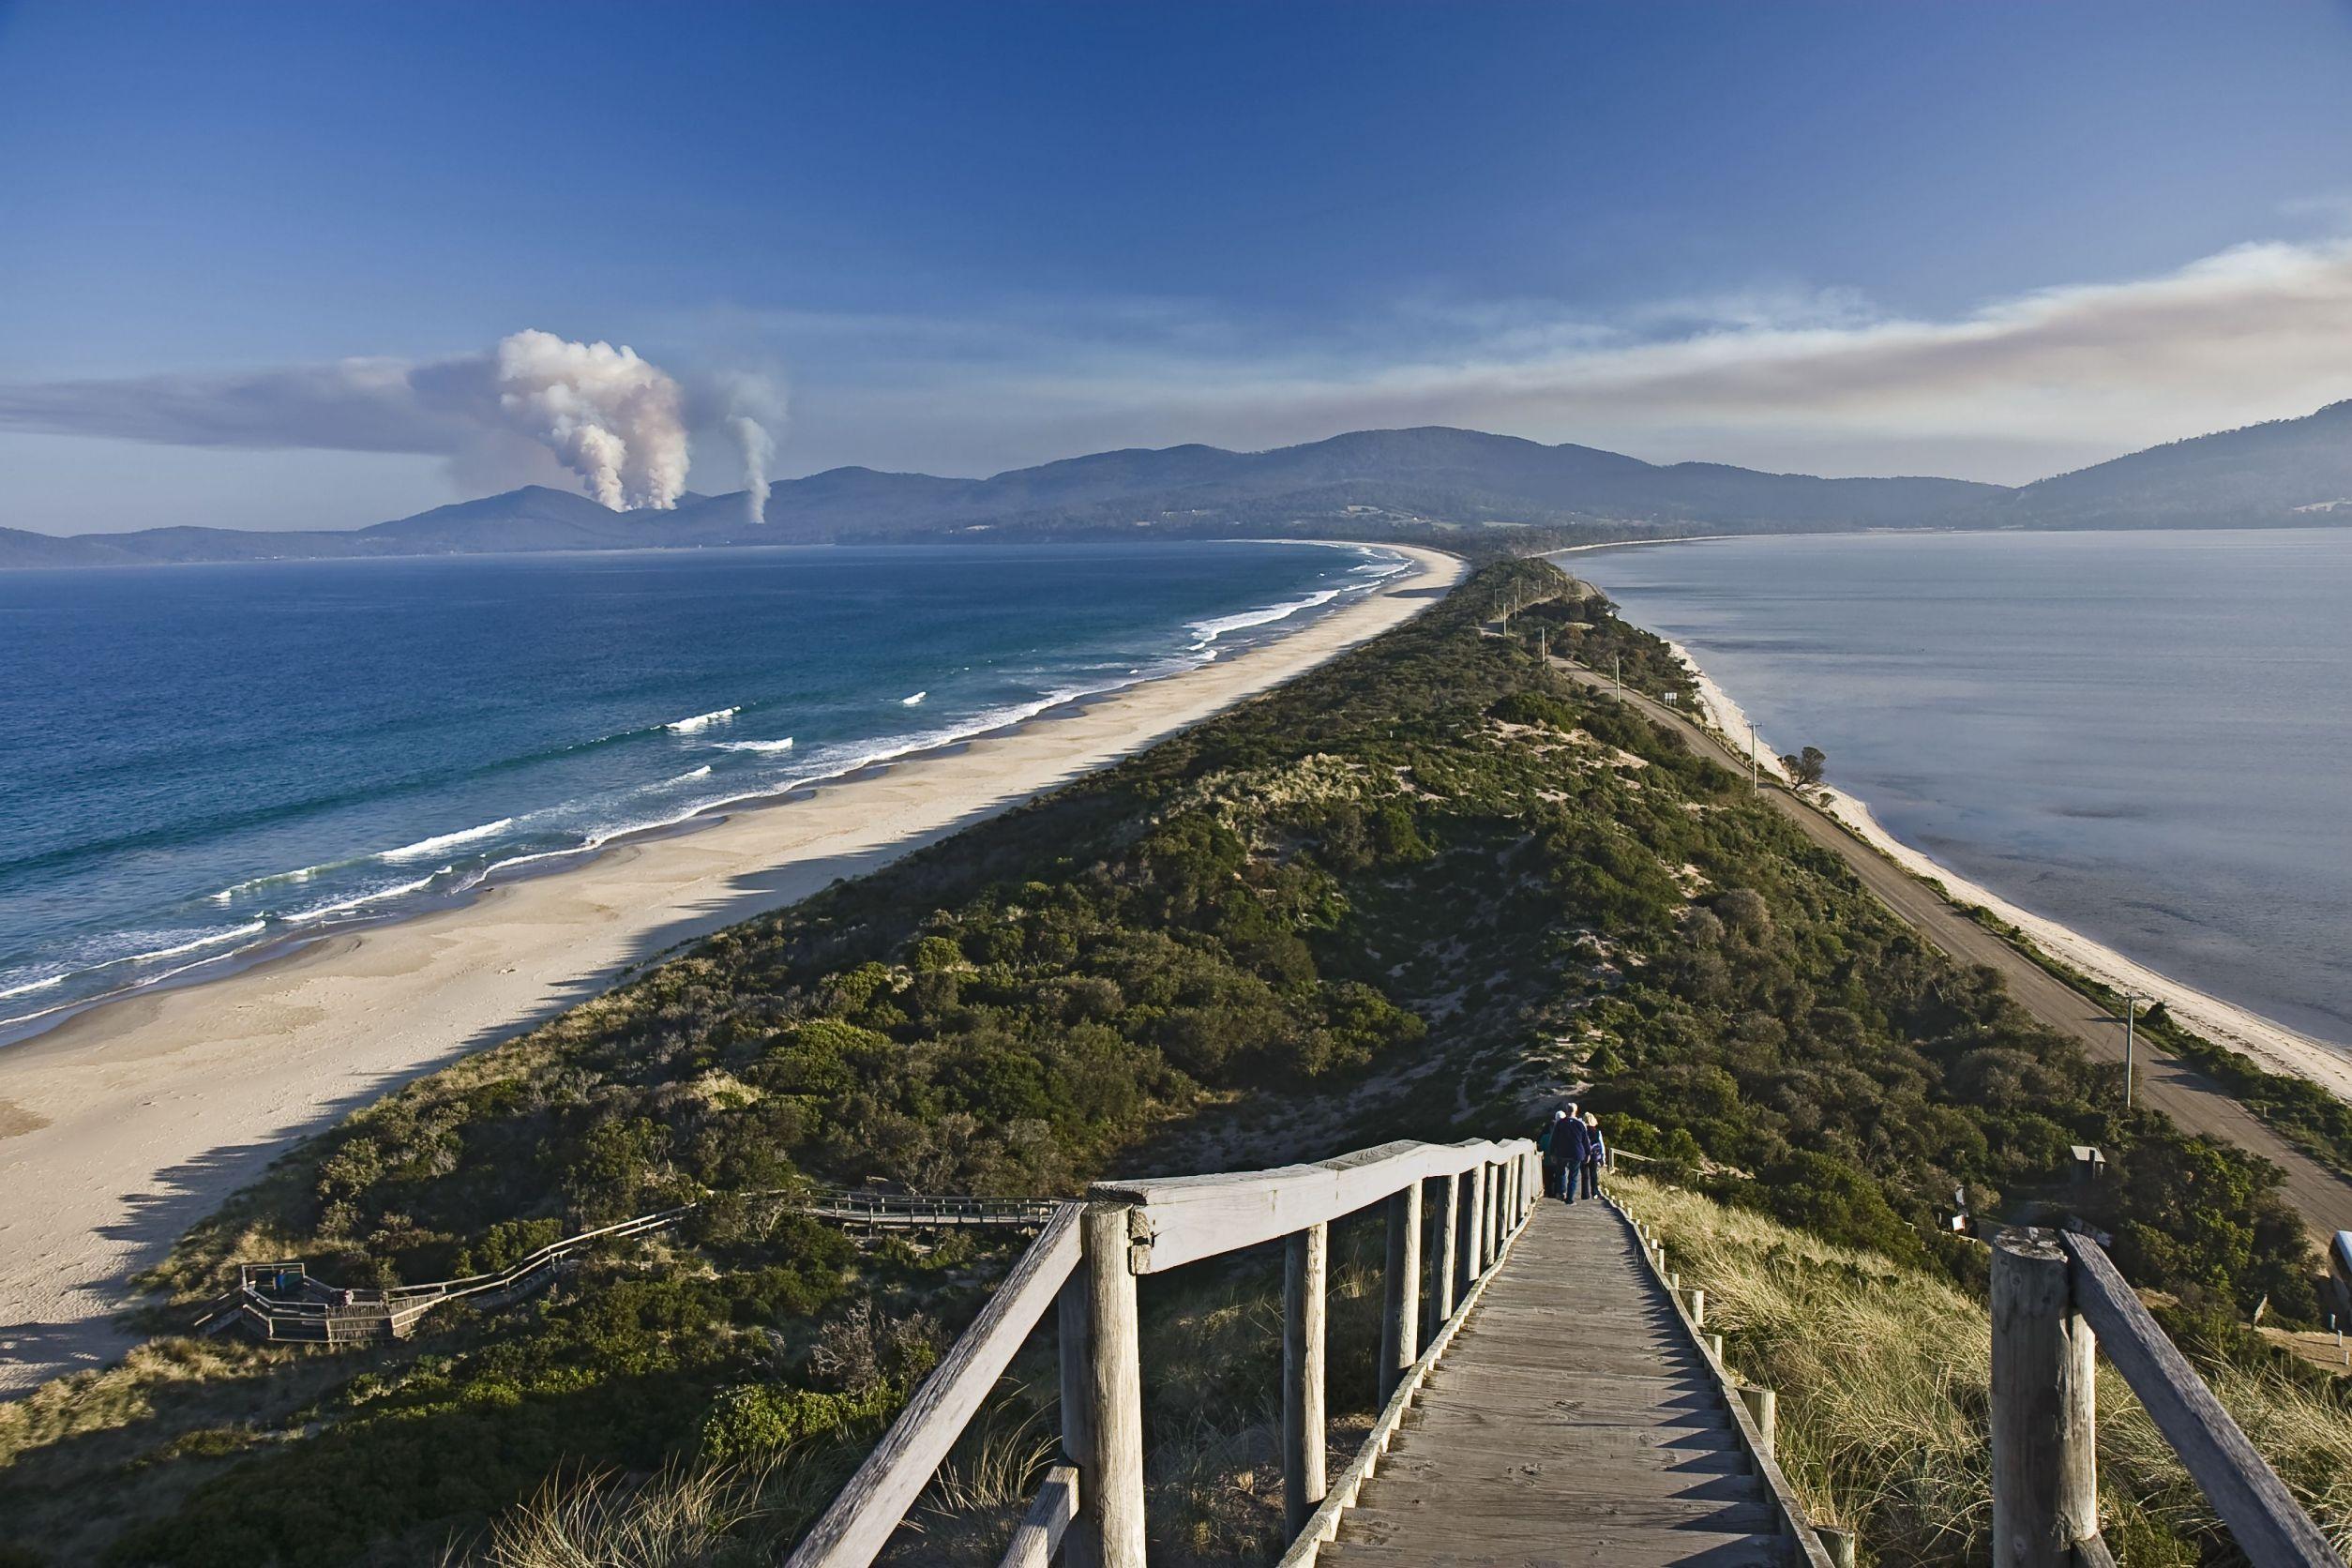 australia long beach tasmania 123rf